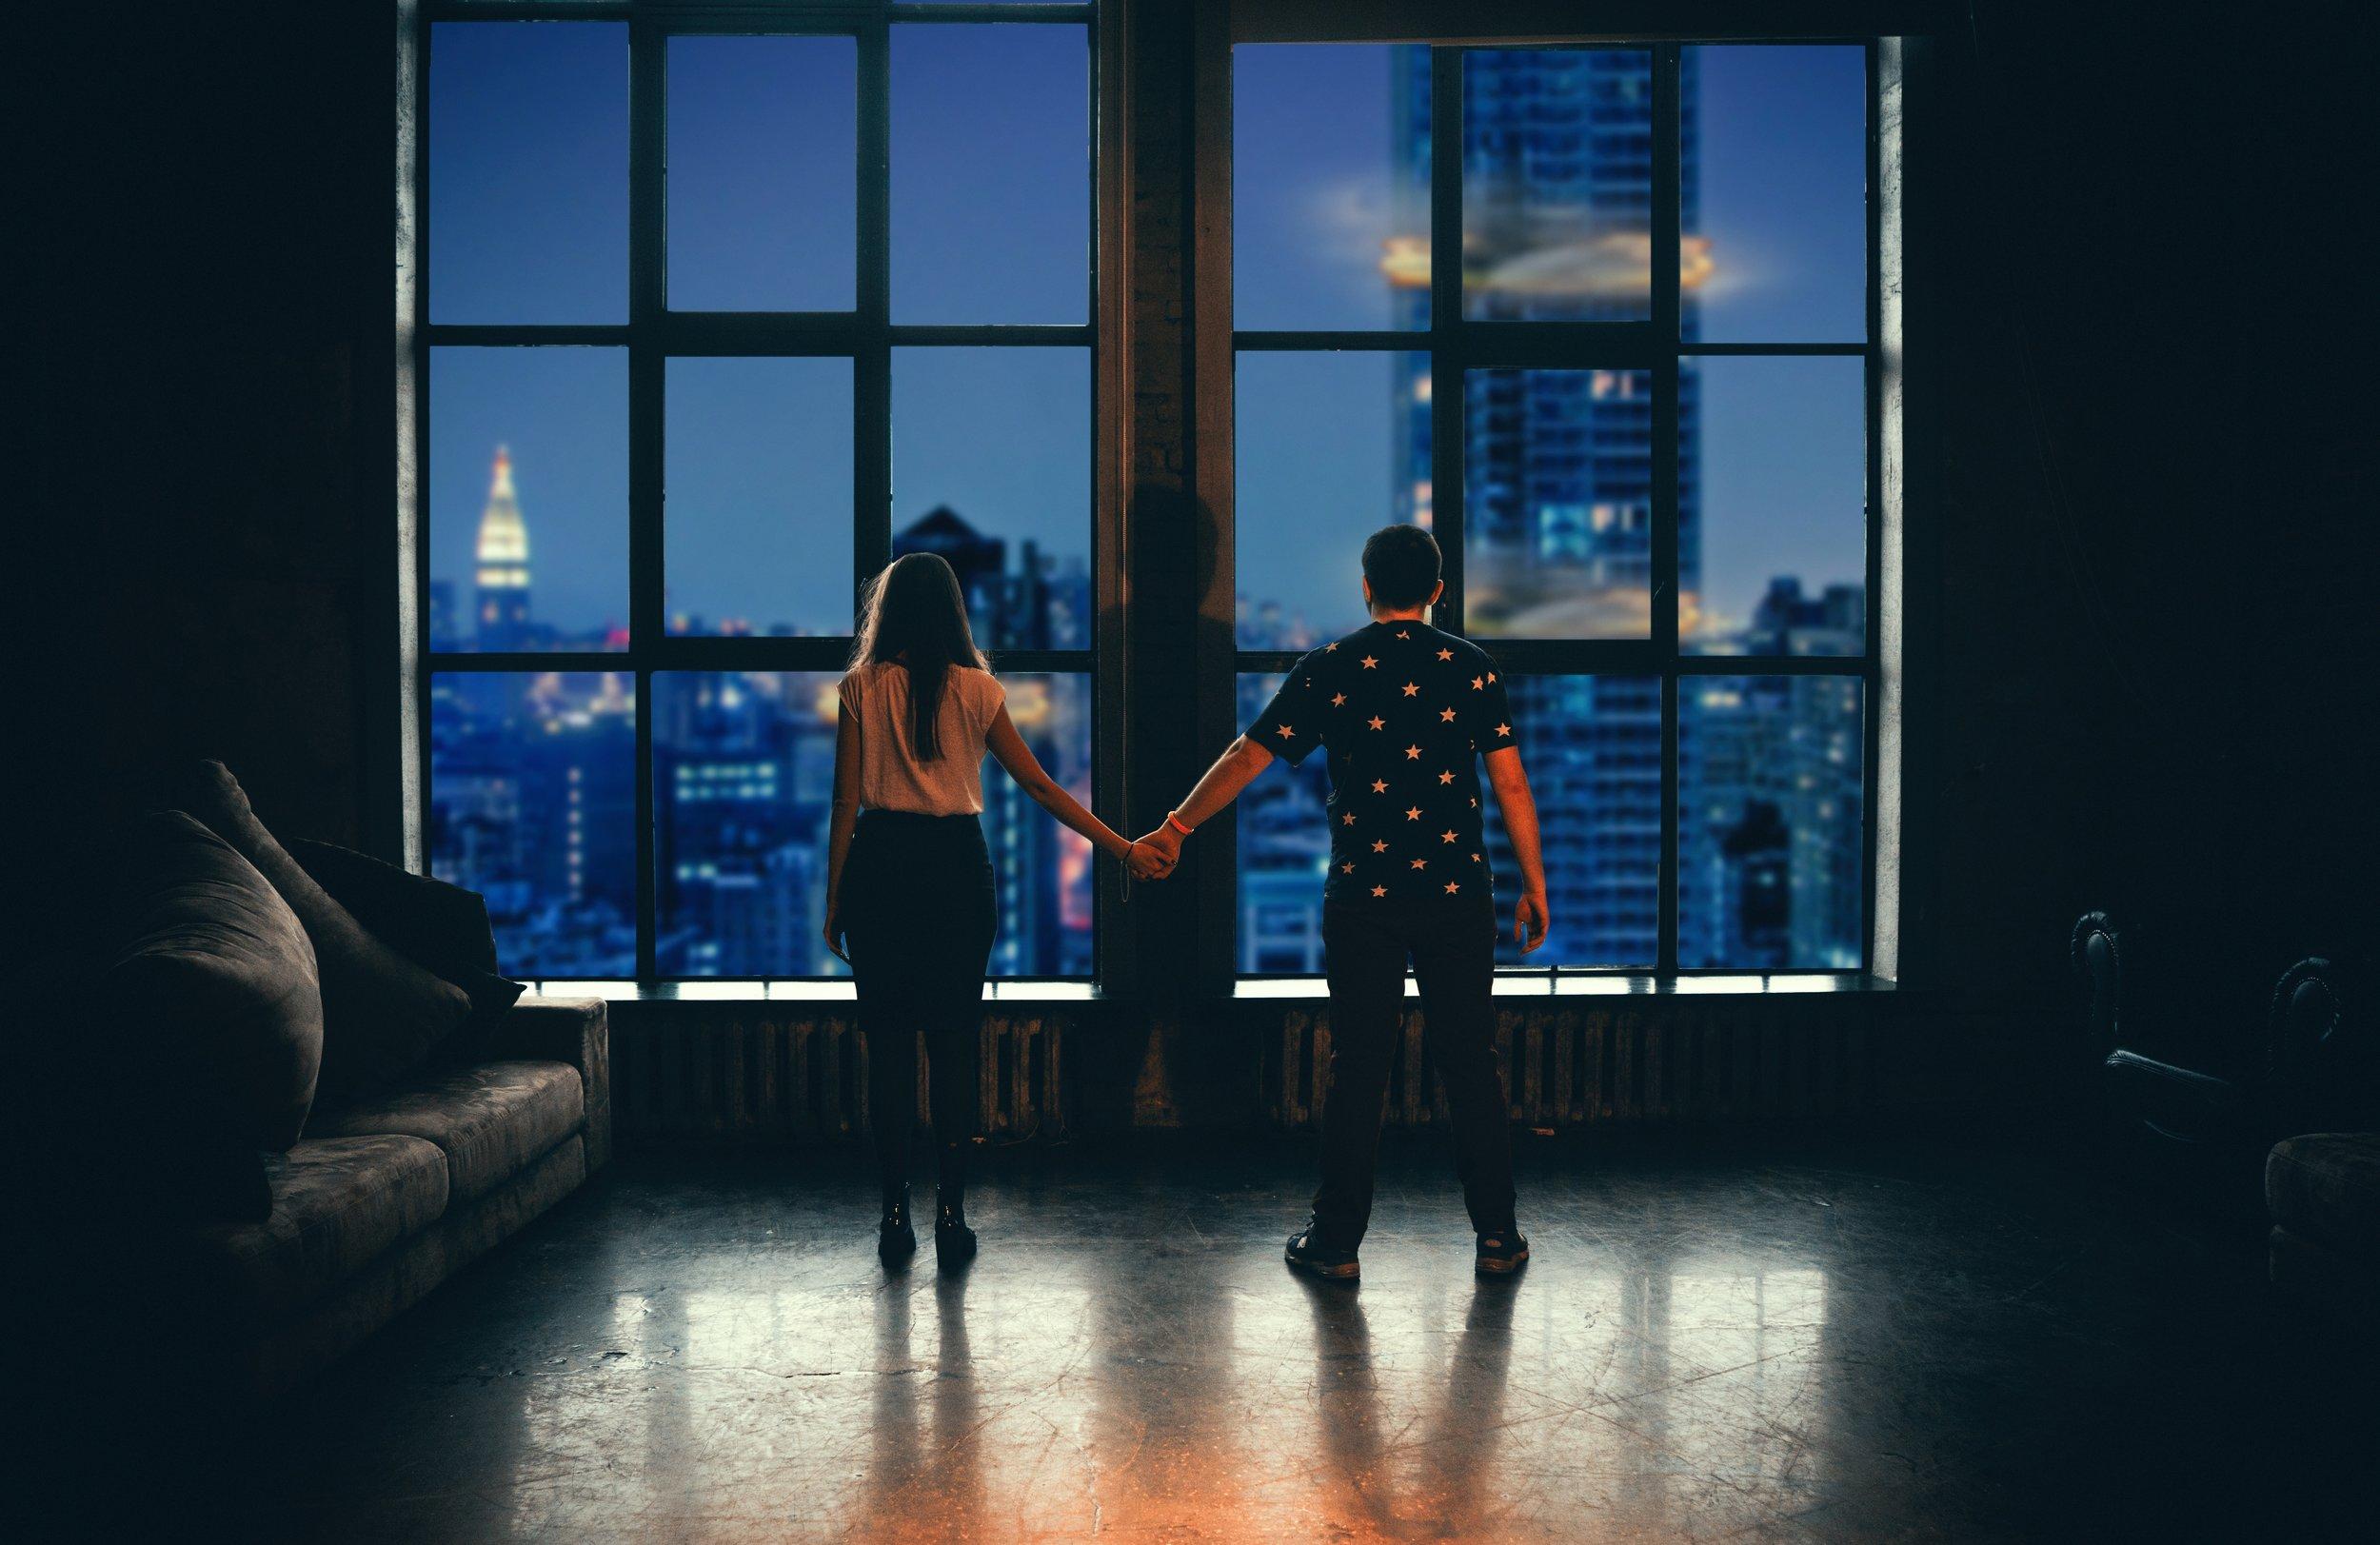 couple at the window.jpg